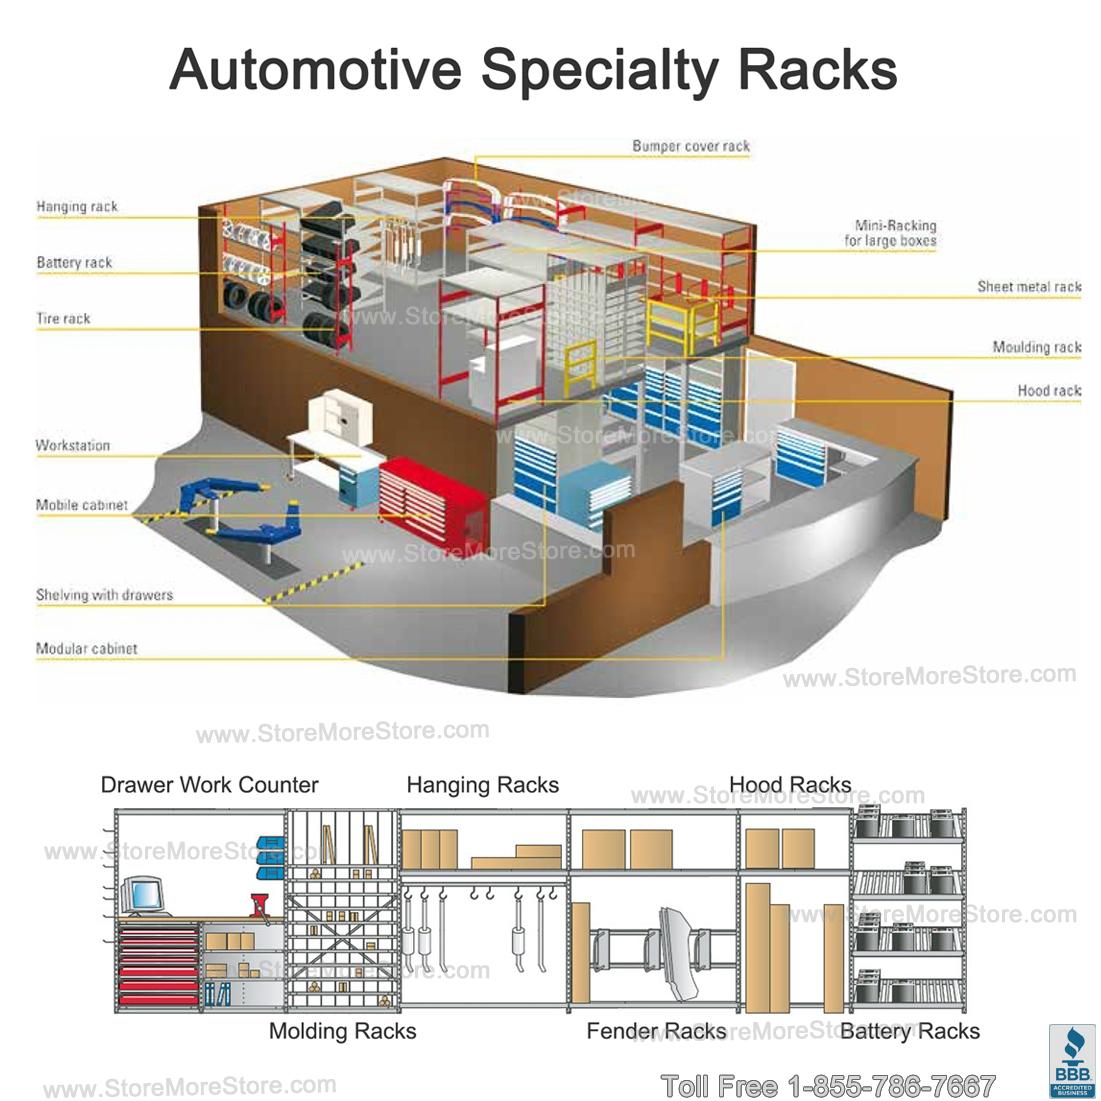 Windshield storage racks srp0480 auto parts room for Parts room organization